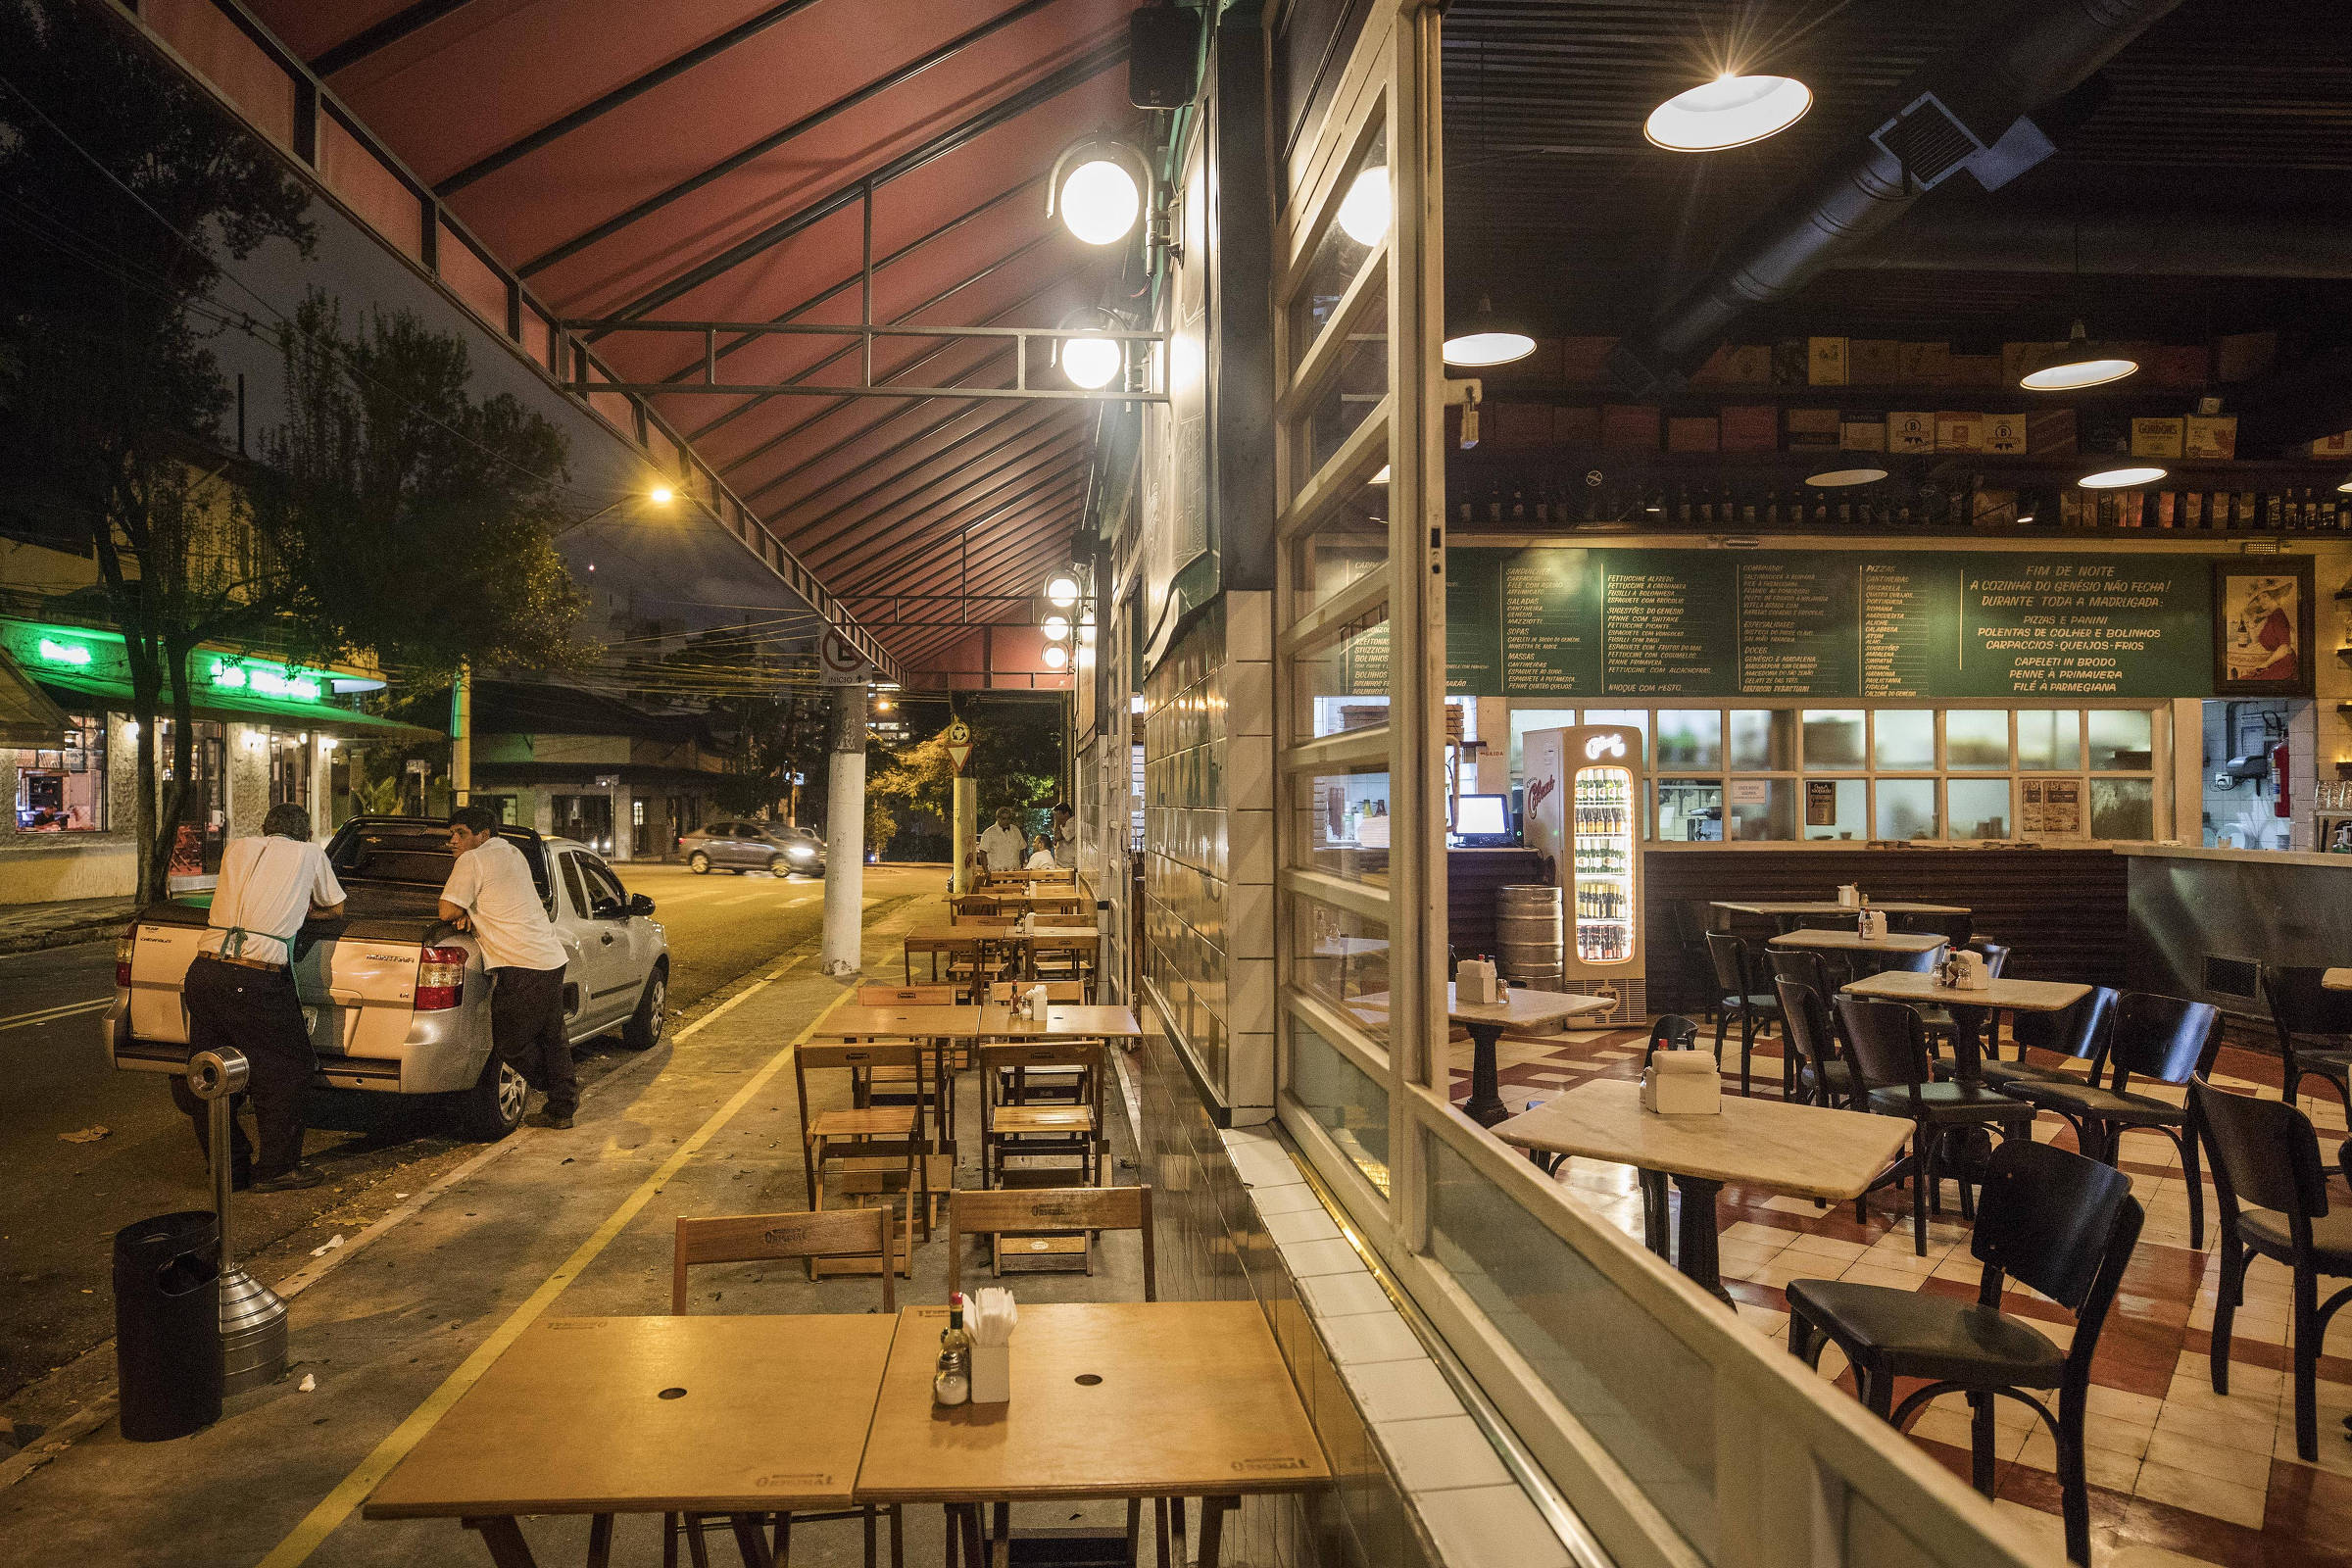 Pandemia fechou 12 mil bares e restaurantes só na capital paulista